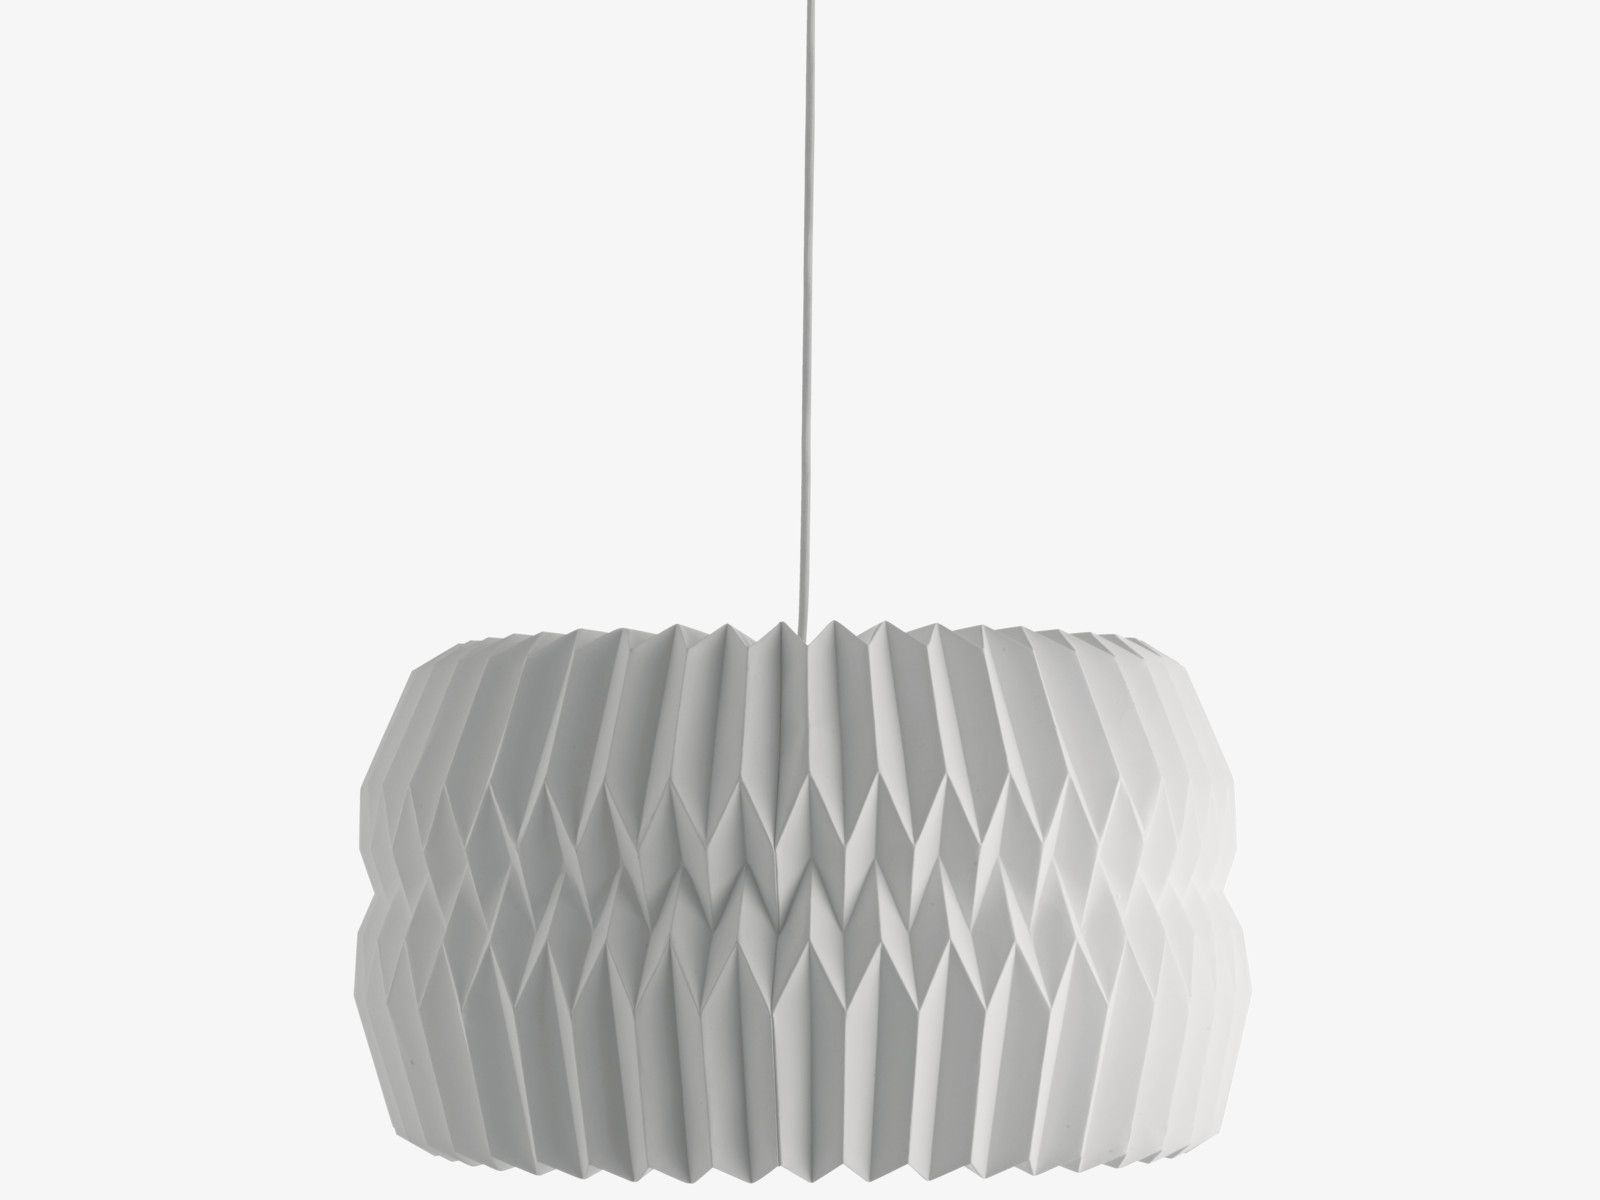 Kura Extra Large White Lampshade White Lamp Shade Ceiling Lamp Shades Ceiling Light Shades